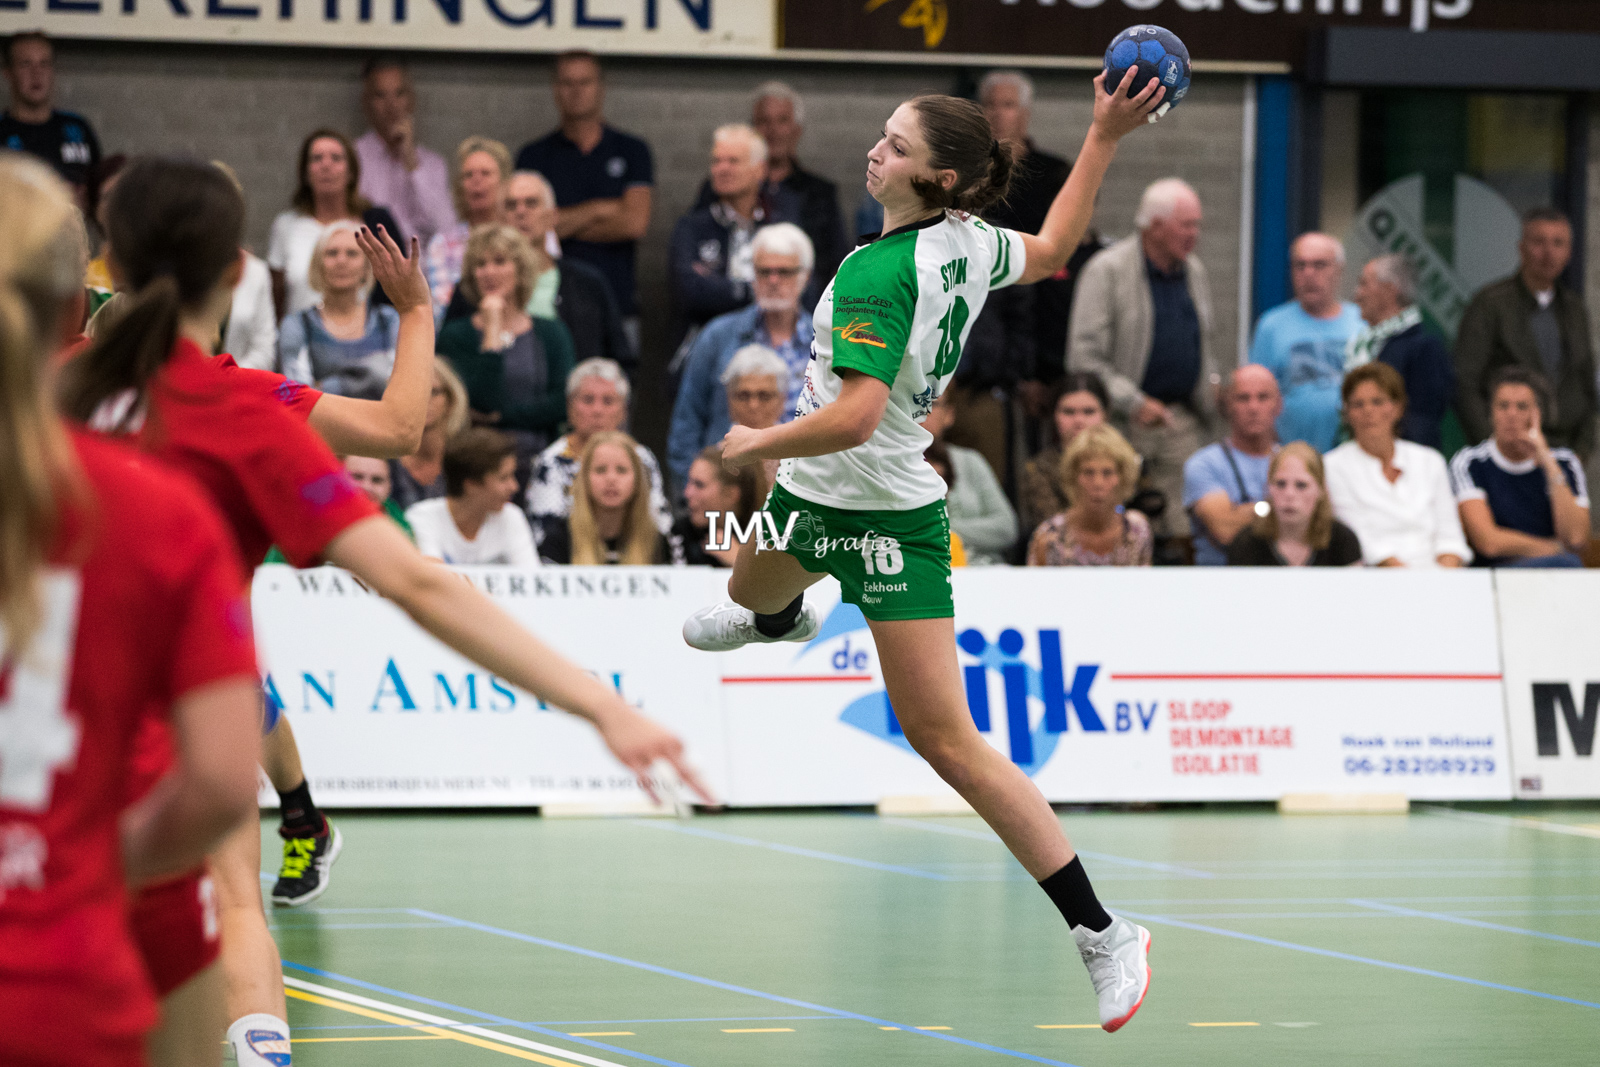 EHF CUP dames Quintus – HIFK HELSINKI 7 september 2019 eindstand 28-19